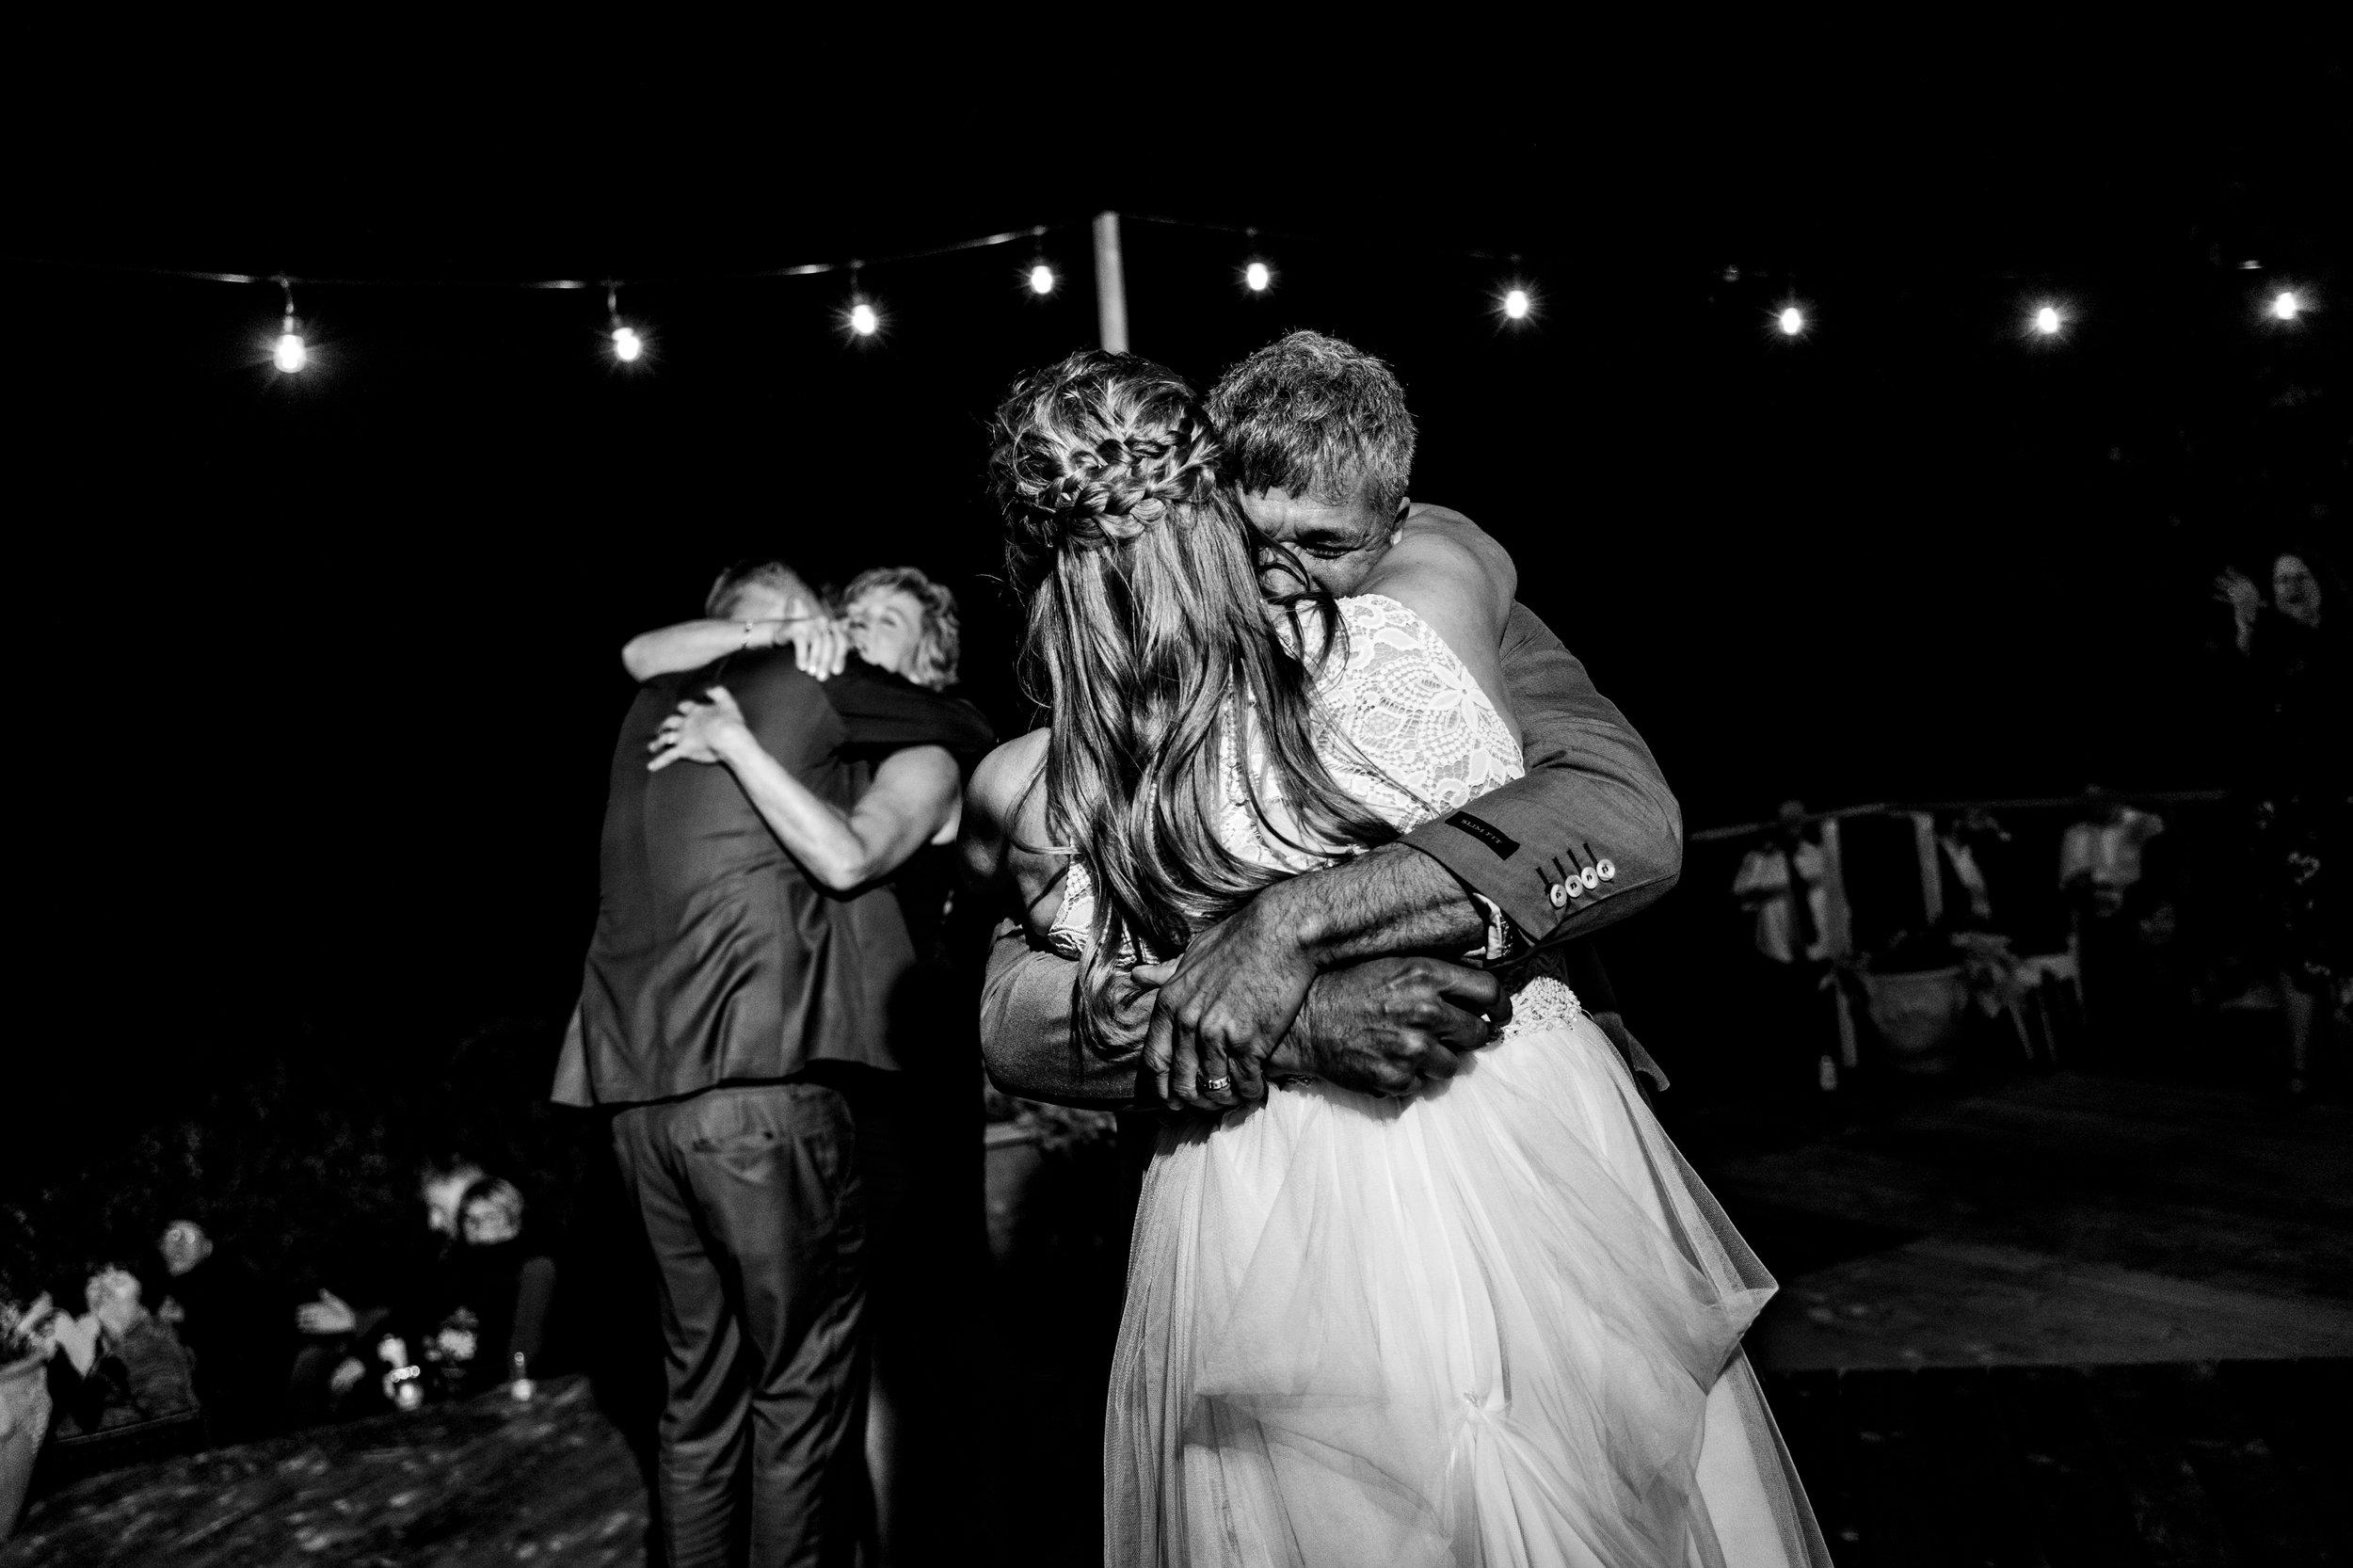 Janelle-Mitch-Halifax-Wedding-Nova-Scotia-Photography (150 of 163).jpg